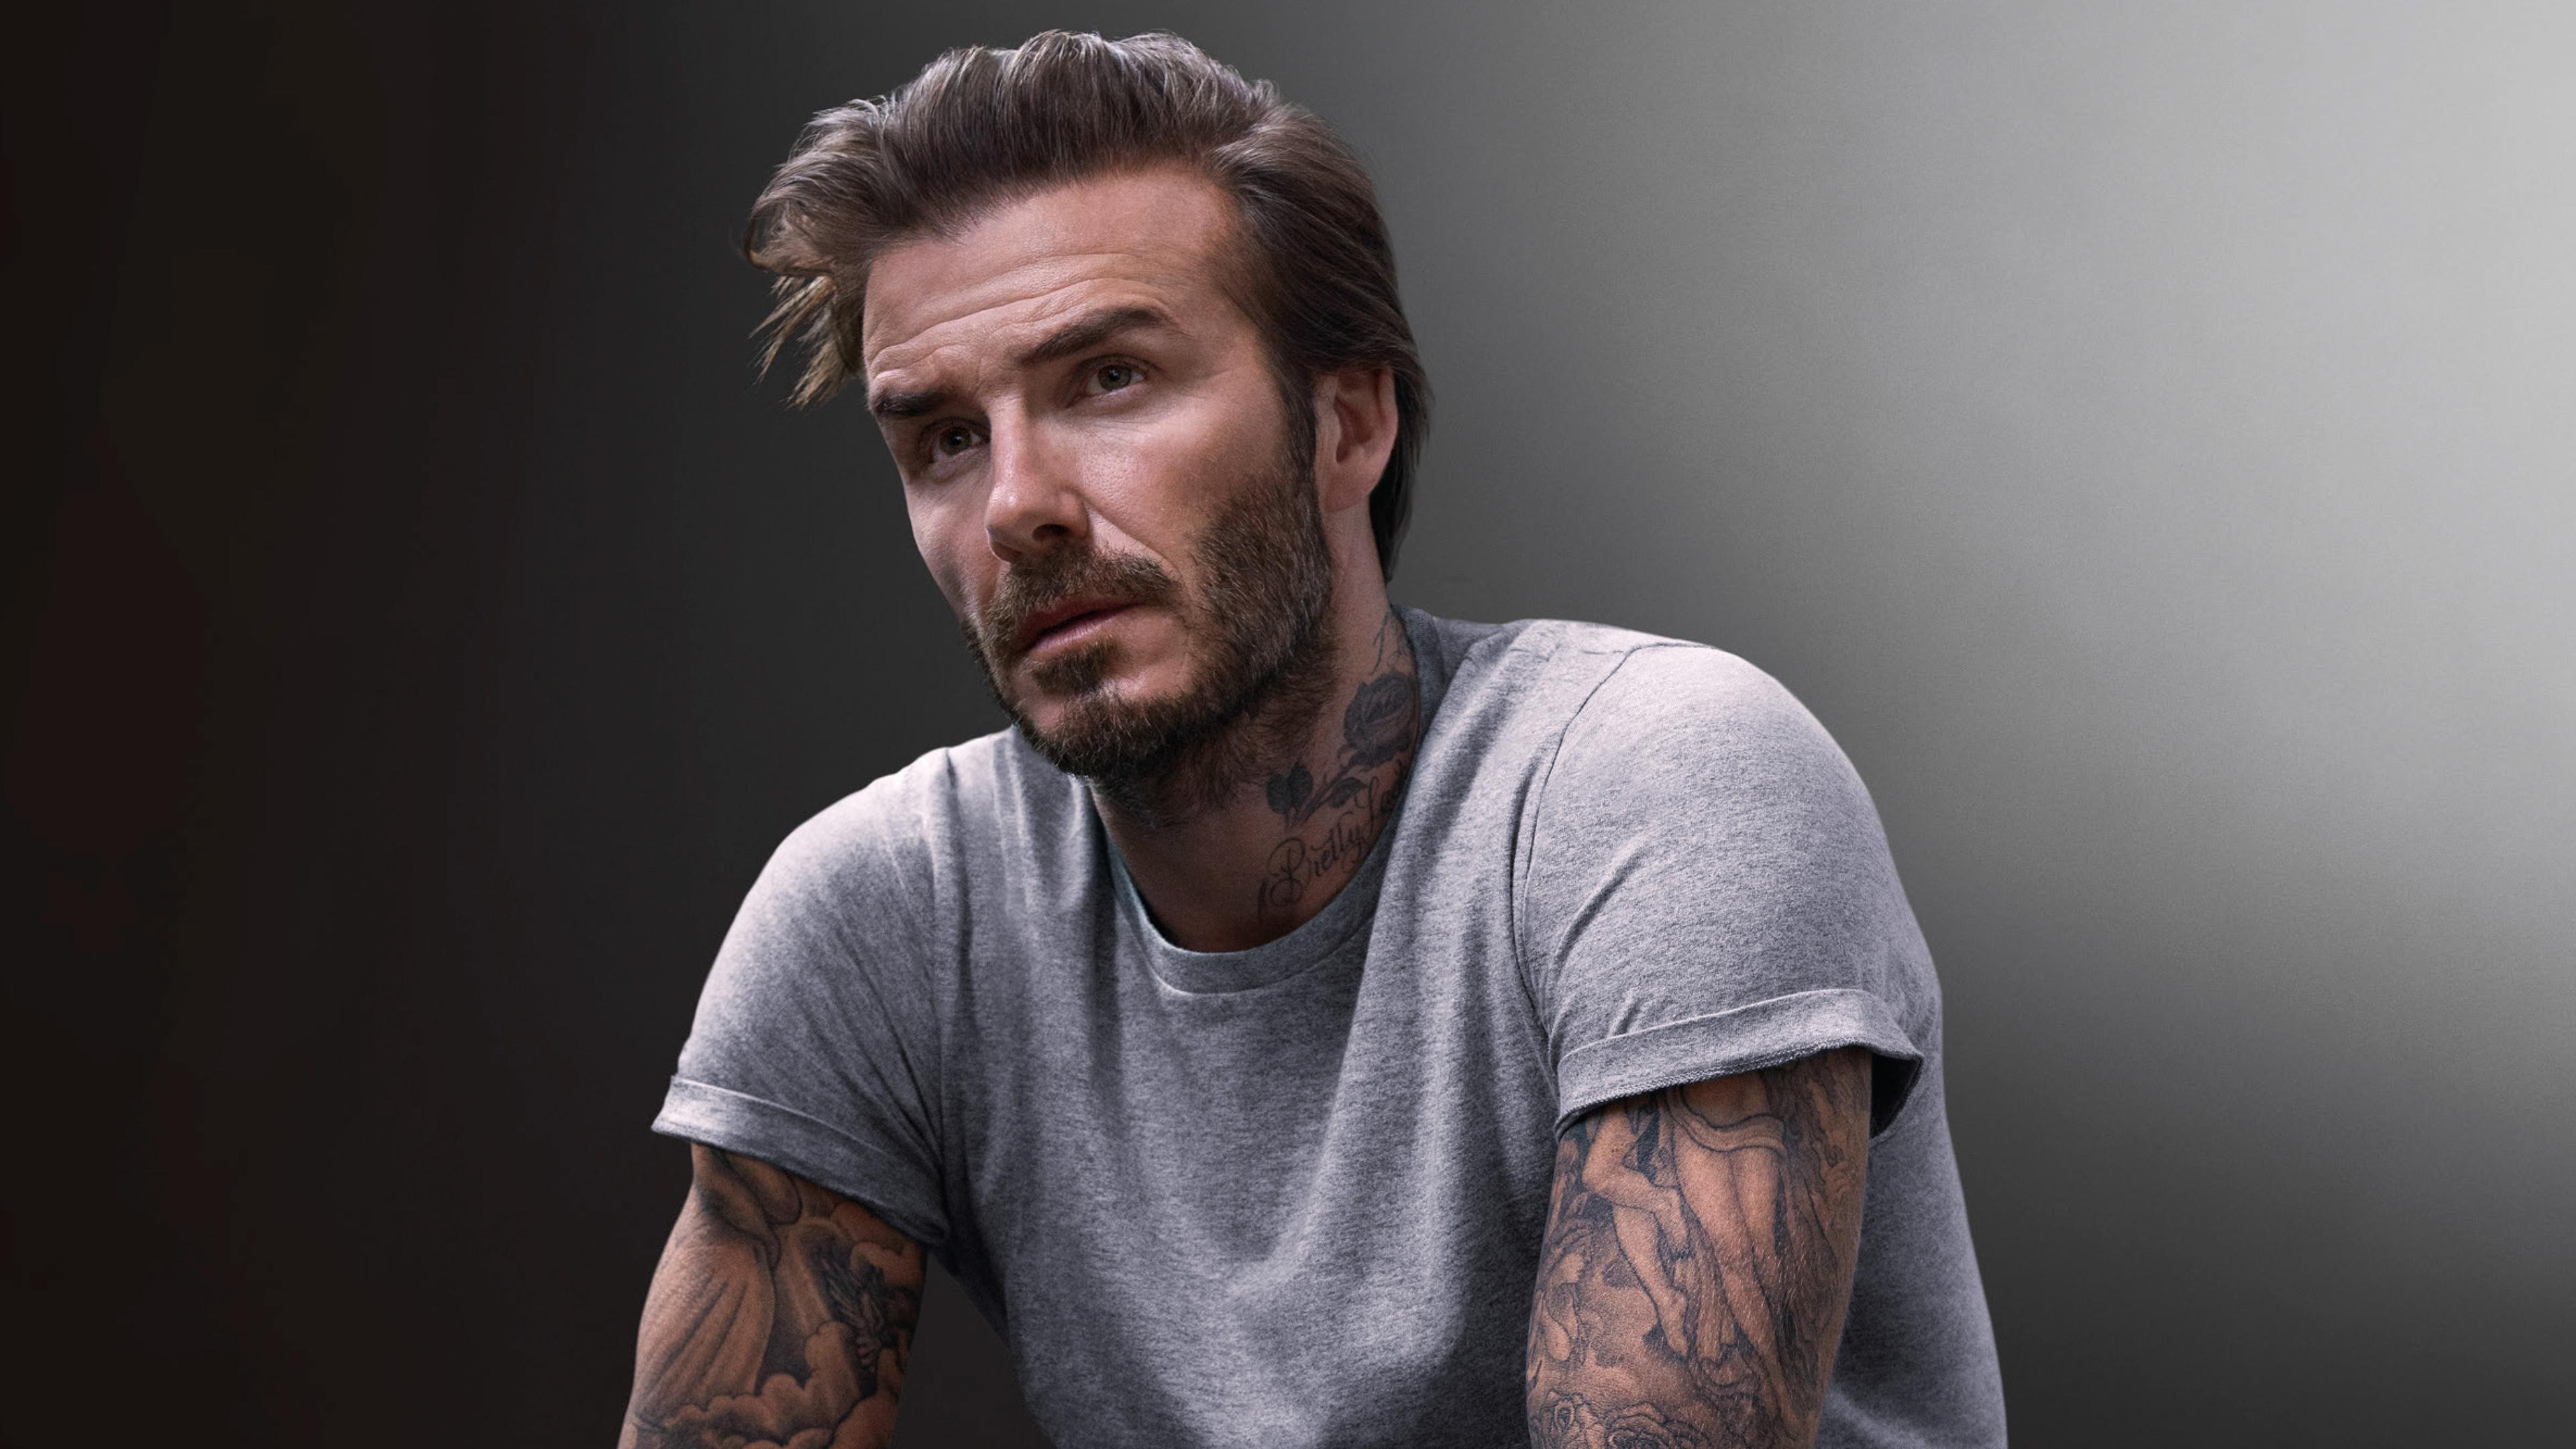 Wallpaper 4k David Beckham 2019 4k 4k Wallpapers Boys Wallpapers